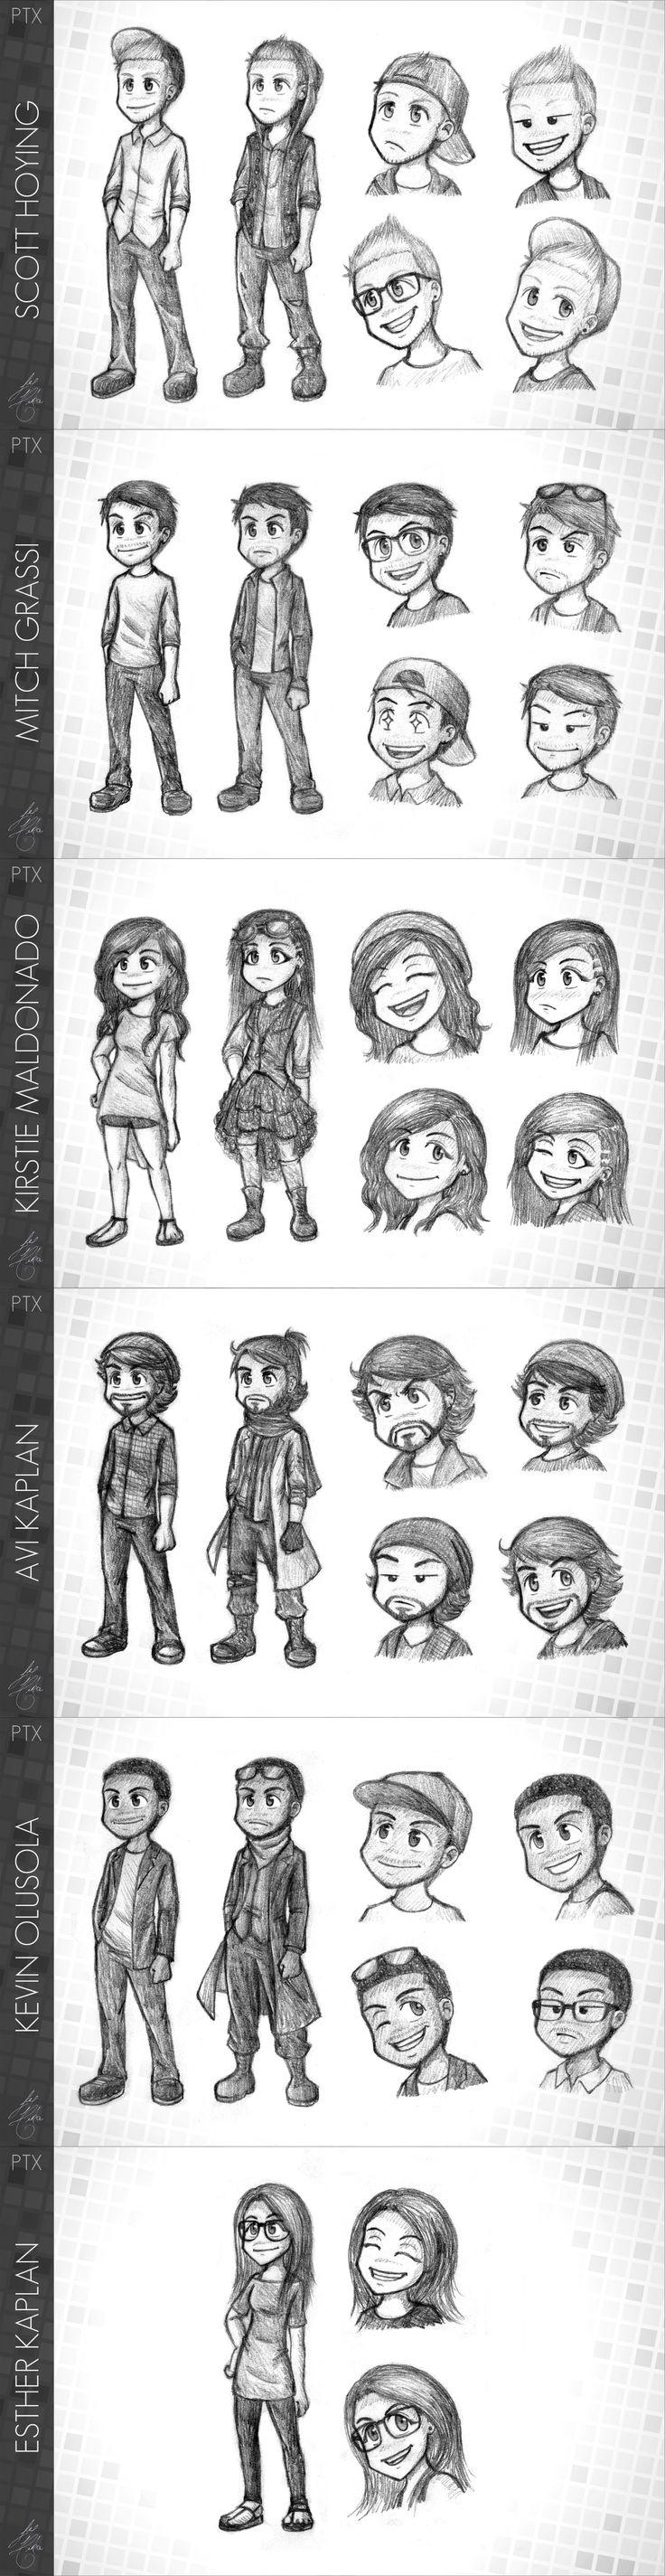 Pentatonix - PTX comic - 6 characters by Raelys-Fenrika.deviantart.com on @DeviantArt